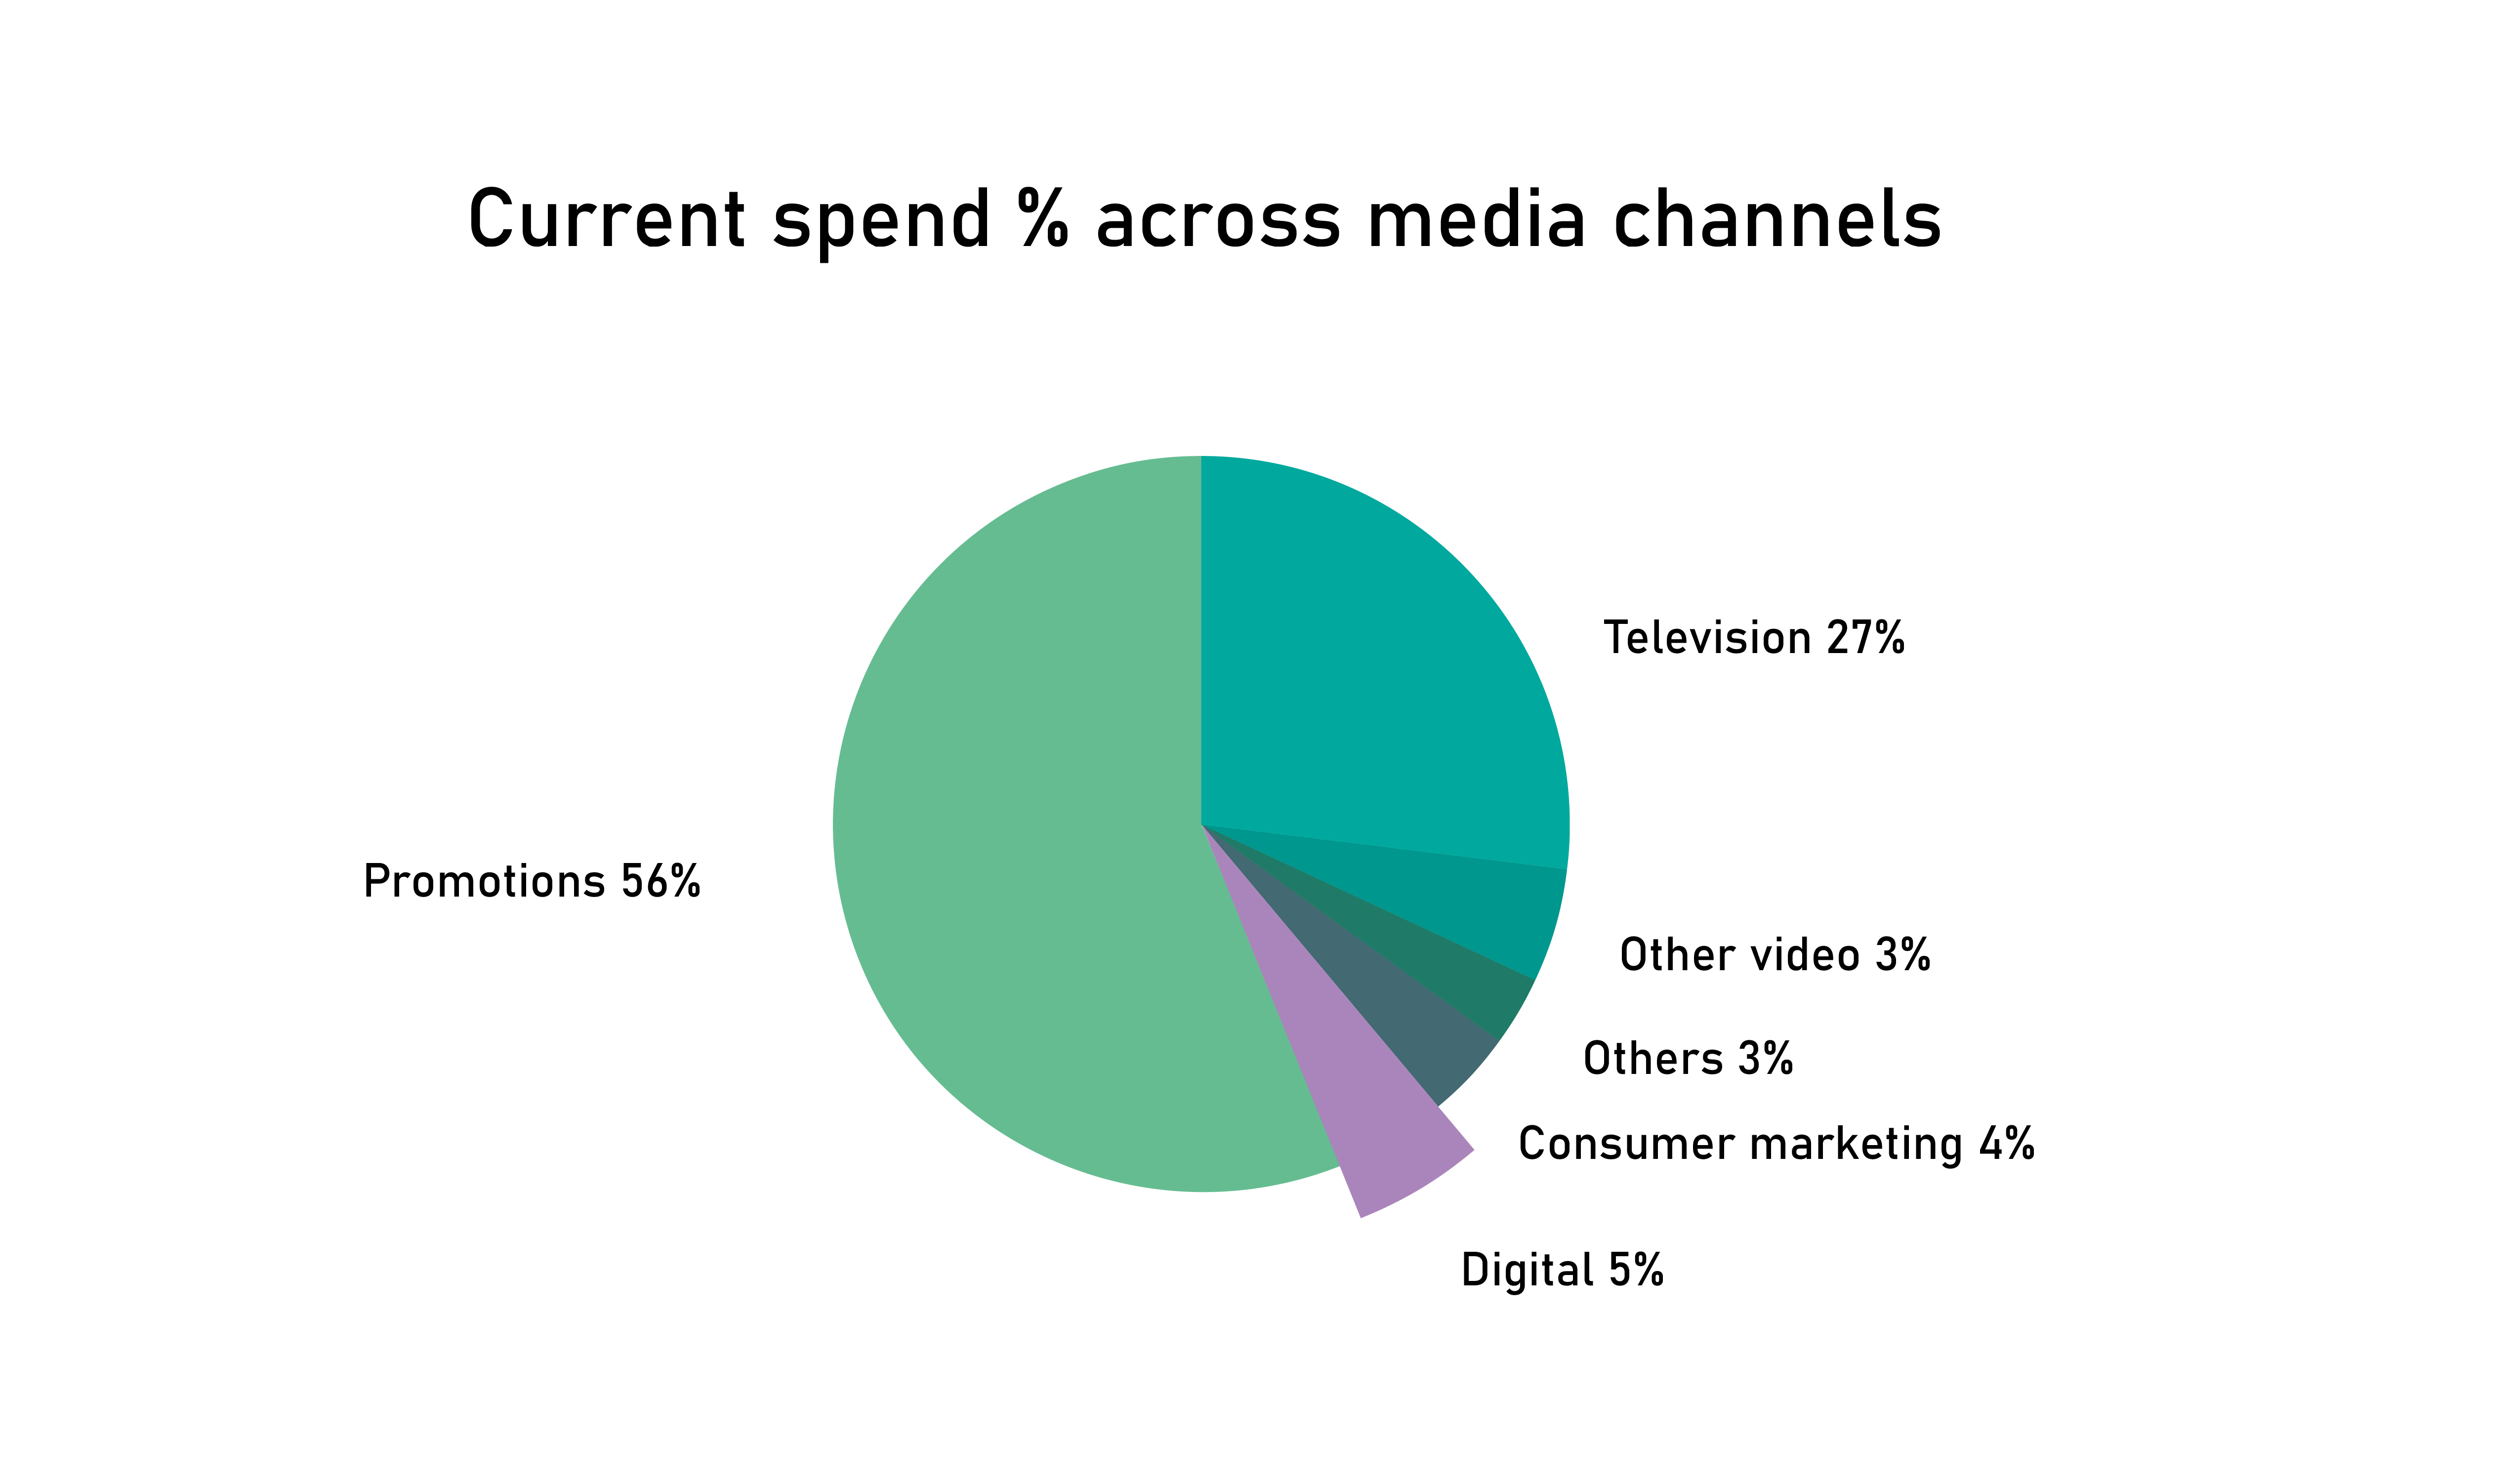 Marketing Media Mix, Media channels, advertising channels, digital advertising, media spend pie chart